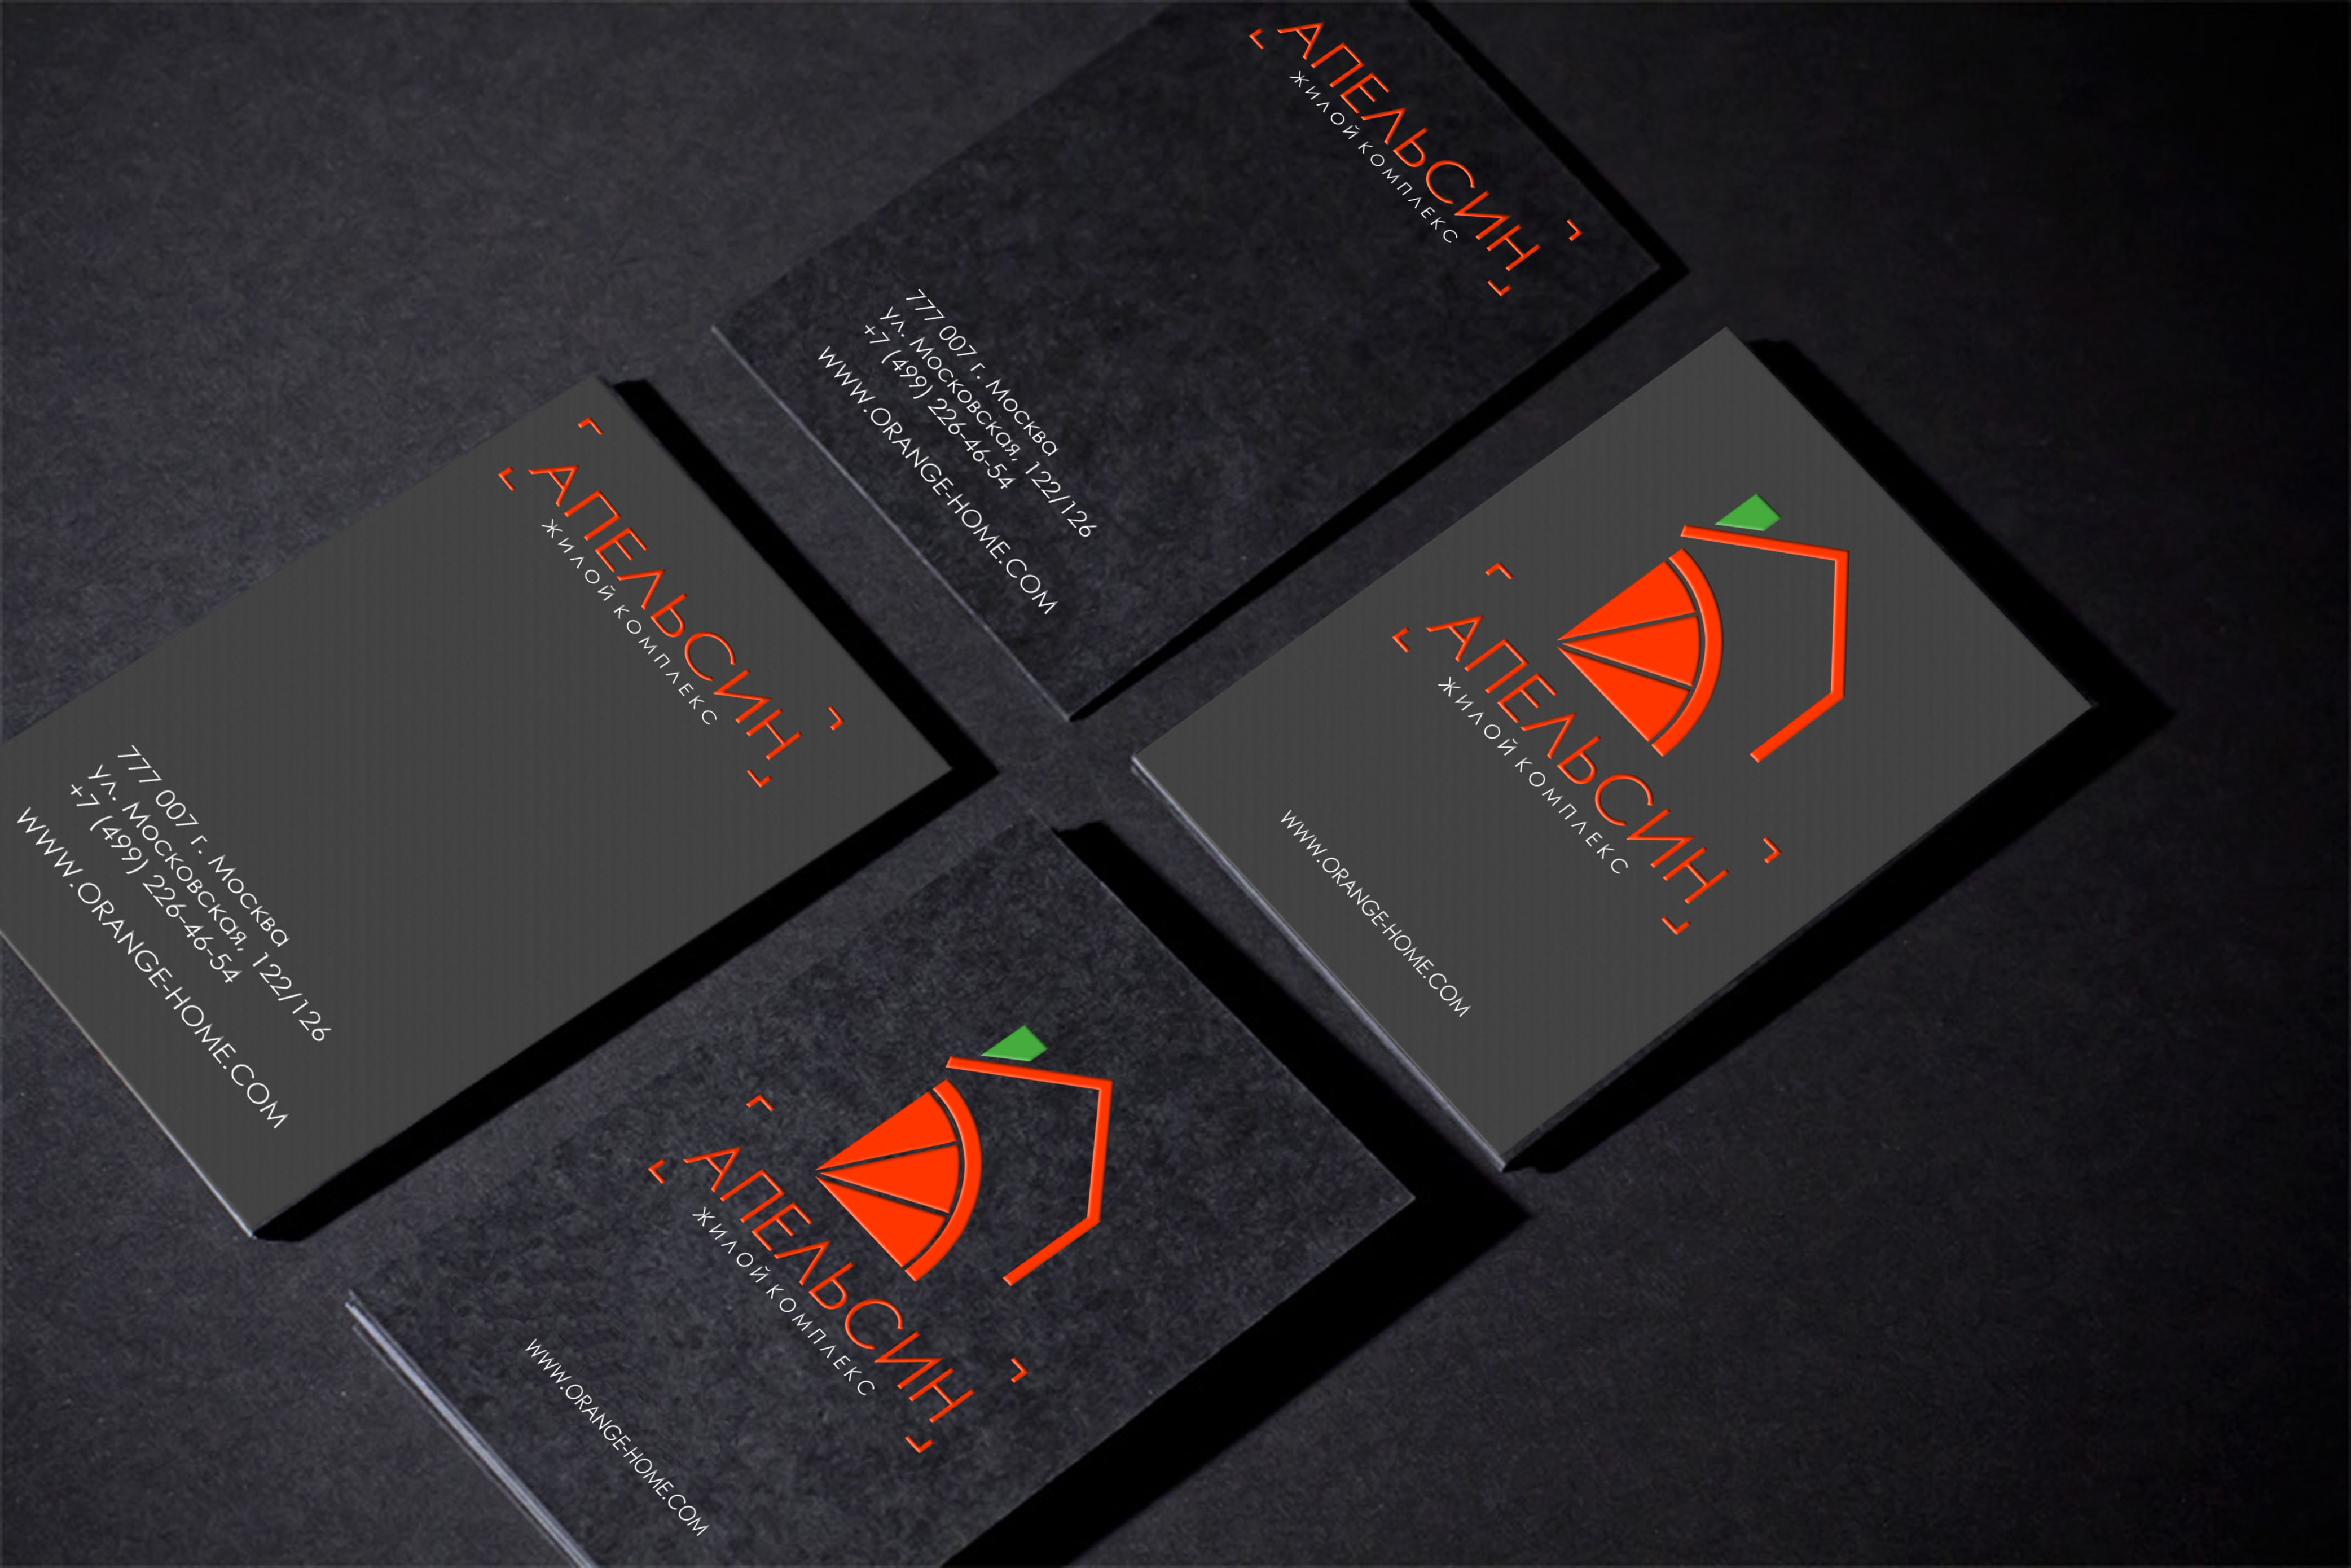 Логотип и фирменный стиль фото f_2025a708926b1b69.jpg